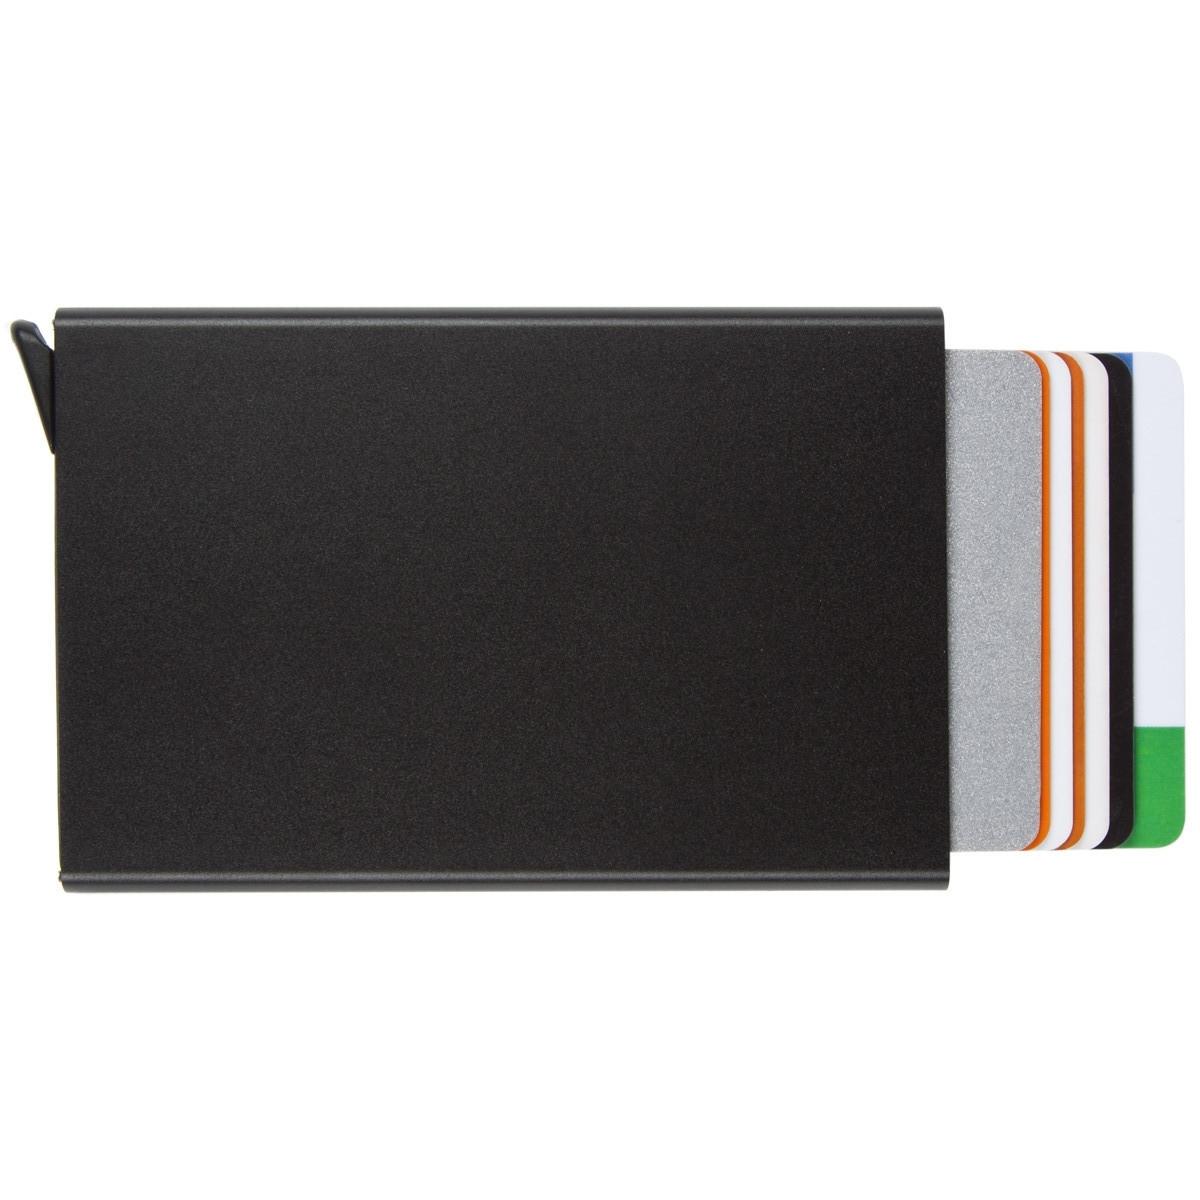 Металлический картхолдер BagHouse черный металлик размер 95х62х9 на 6 карт м КХМч